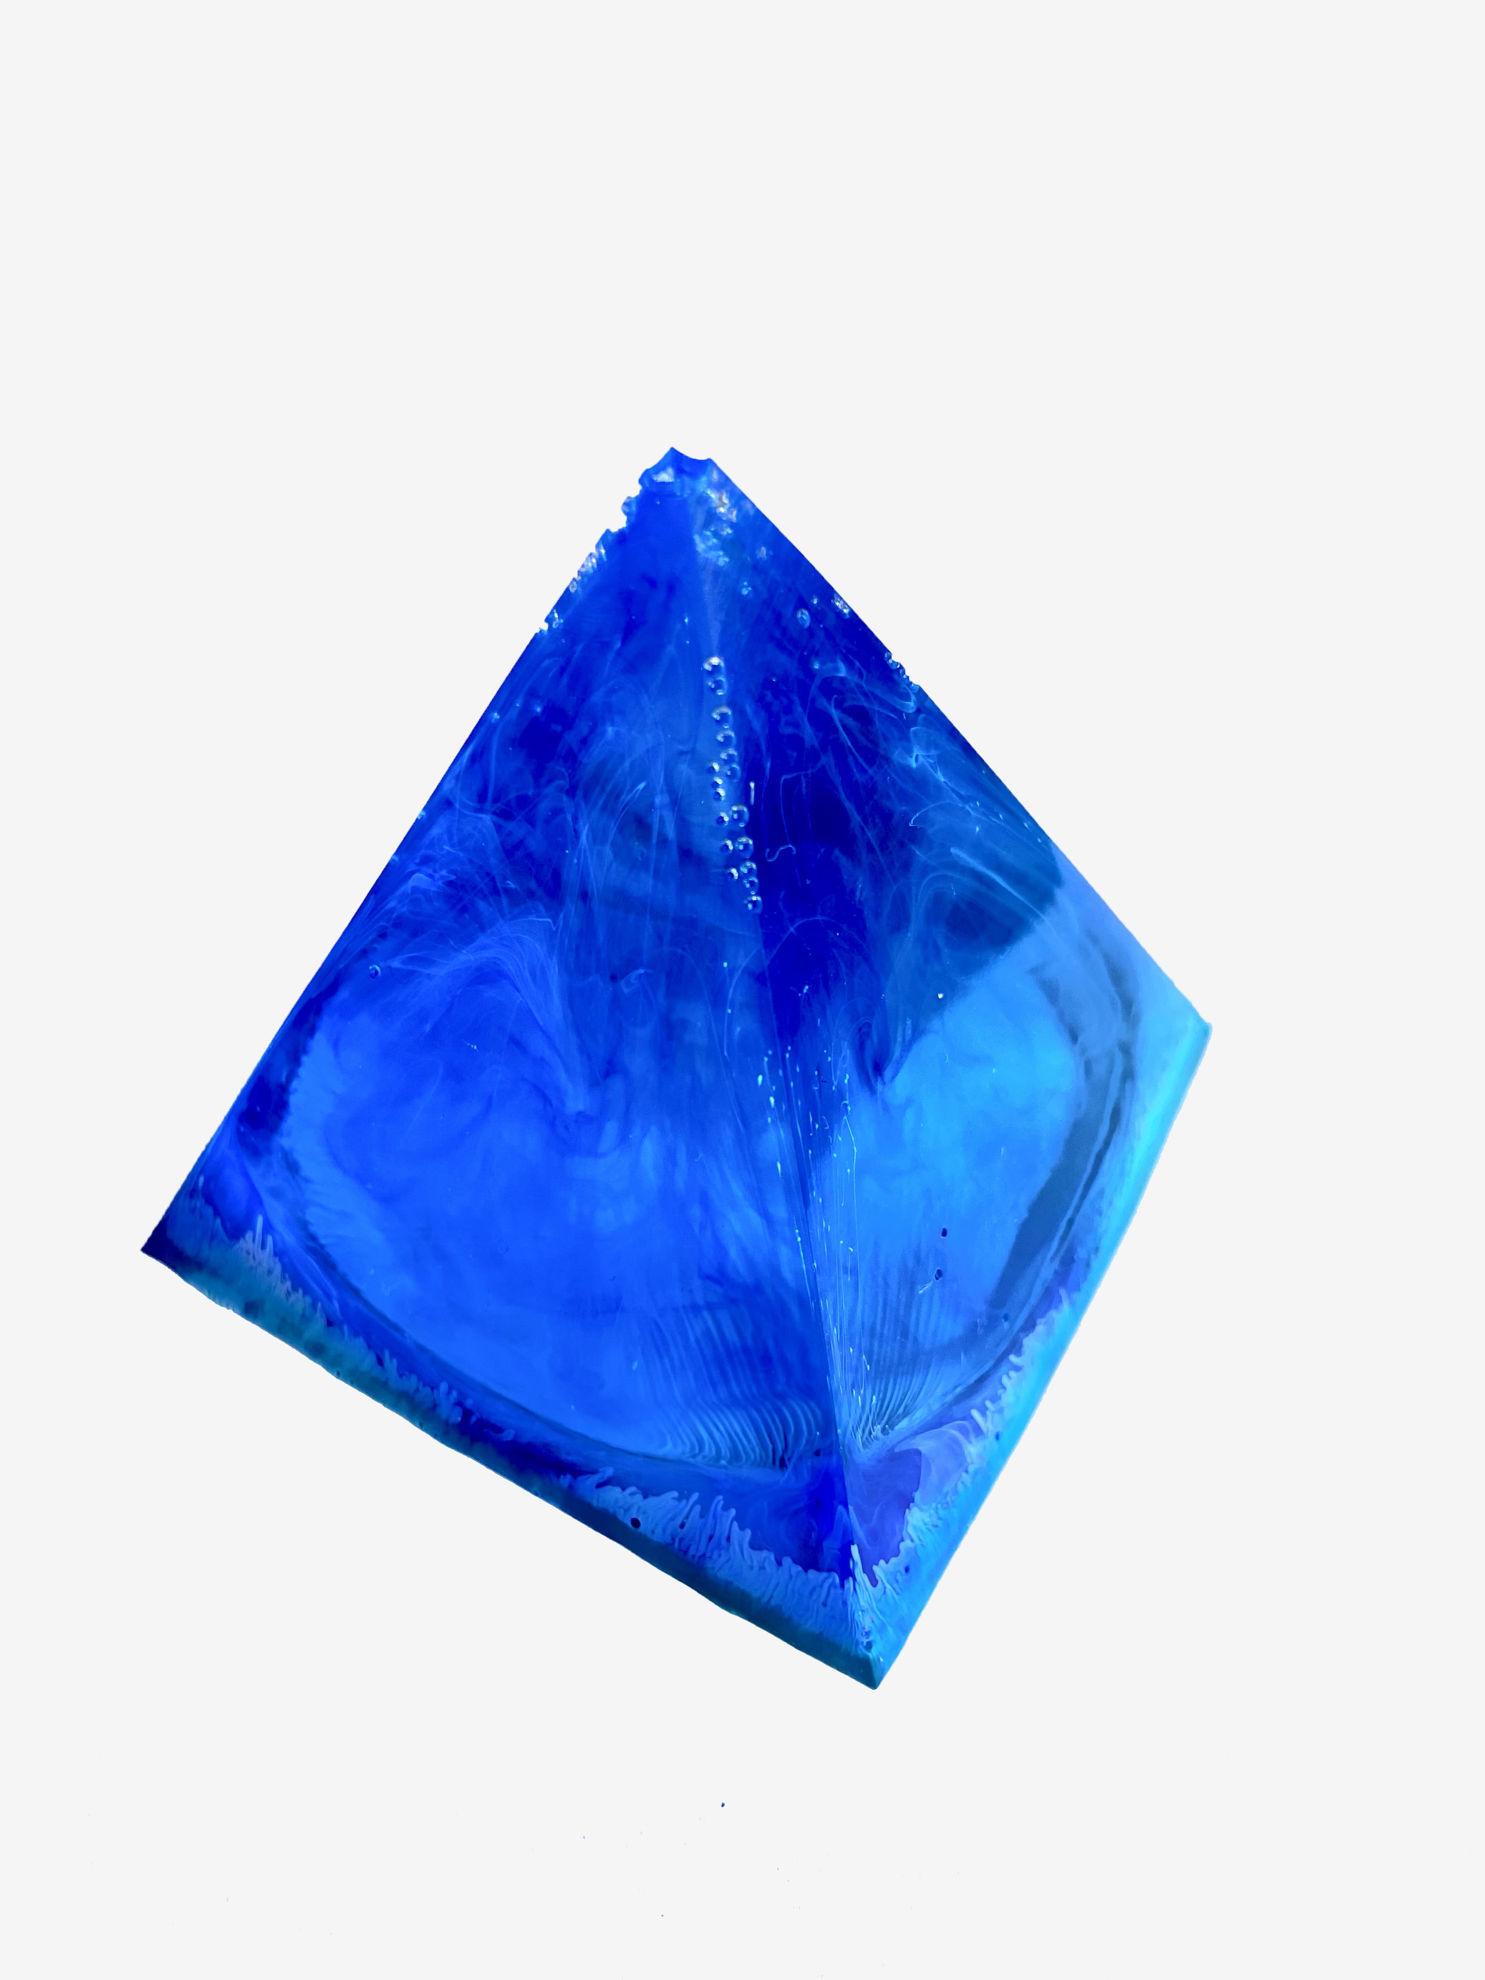 Blue Swirl Small Pyramid by Spirited Pyramids